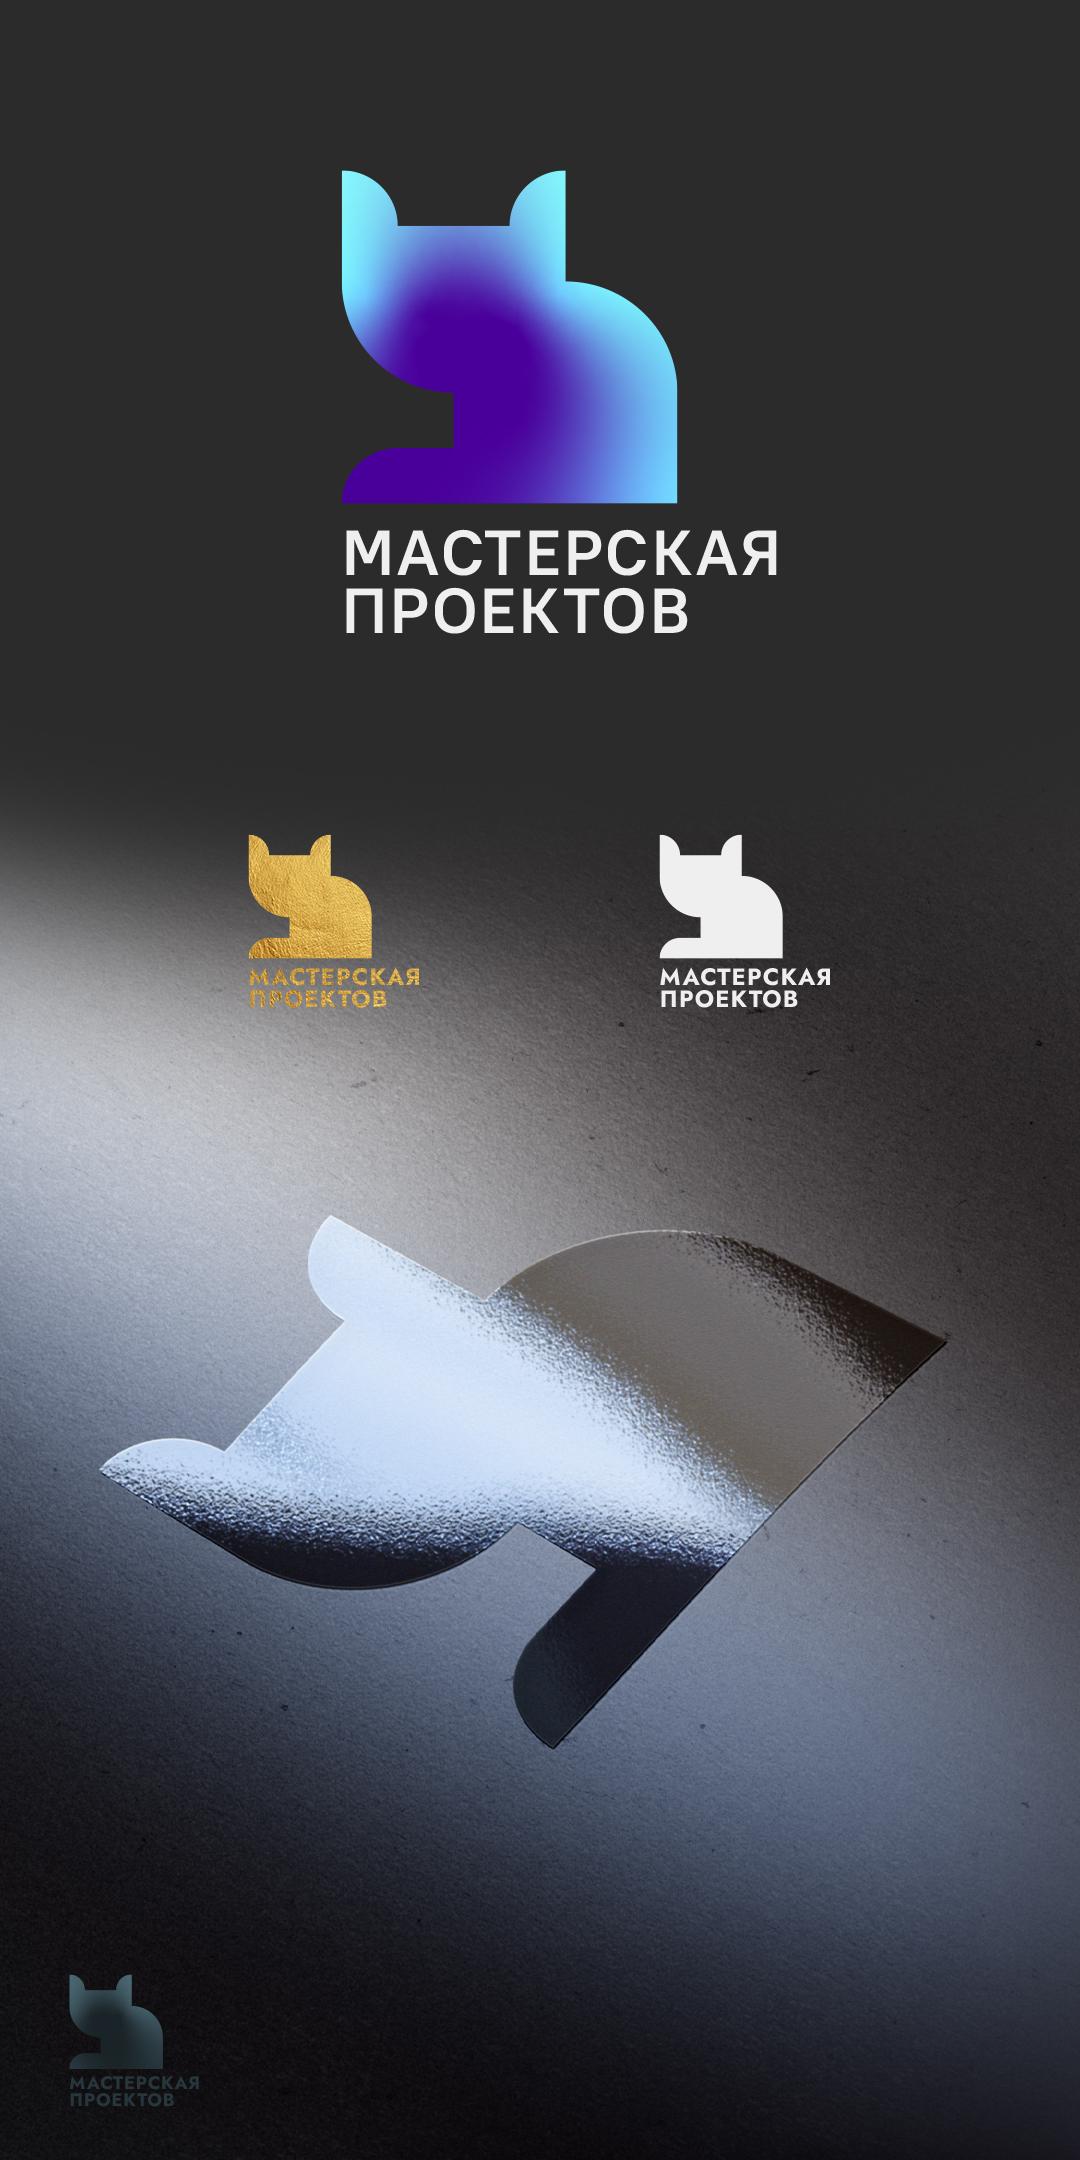 Разработка логотипа строительно-мебельного проекта (см. опис фото f_496606e996768a1a.jpg